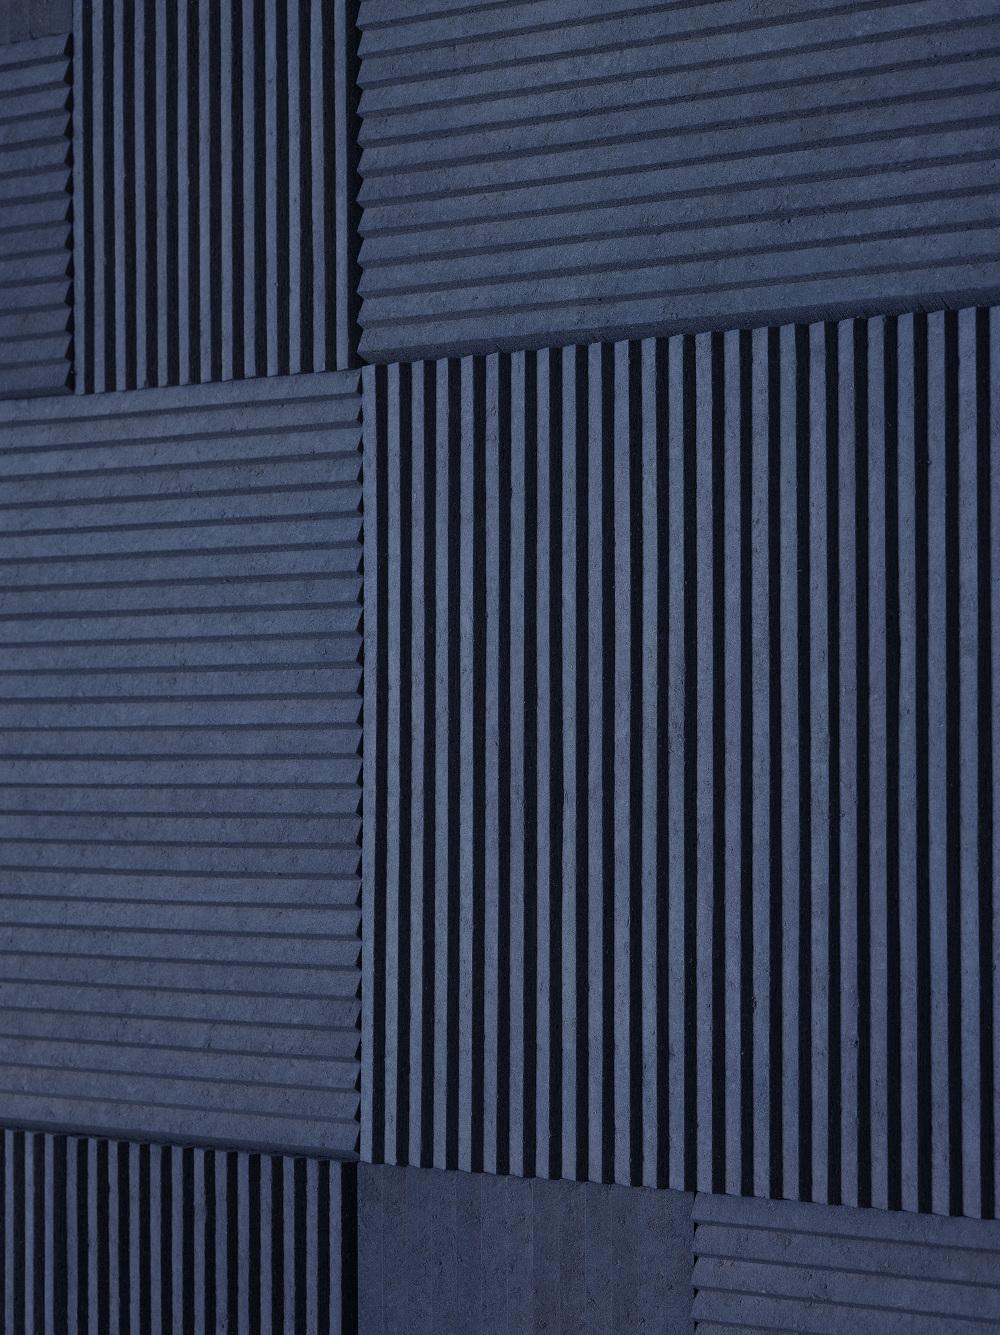 Rimpi Acoustic Panel Maija Puoskari